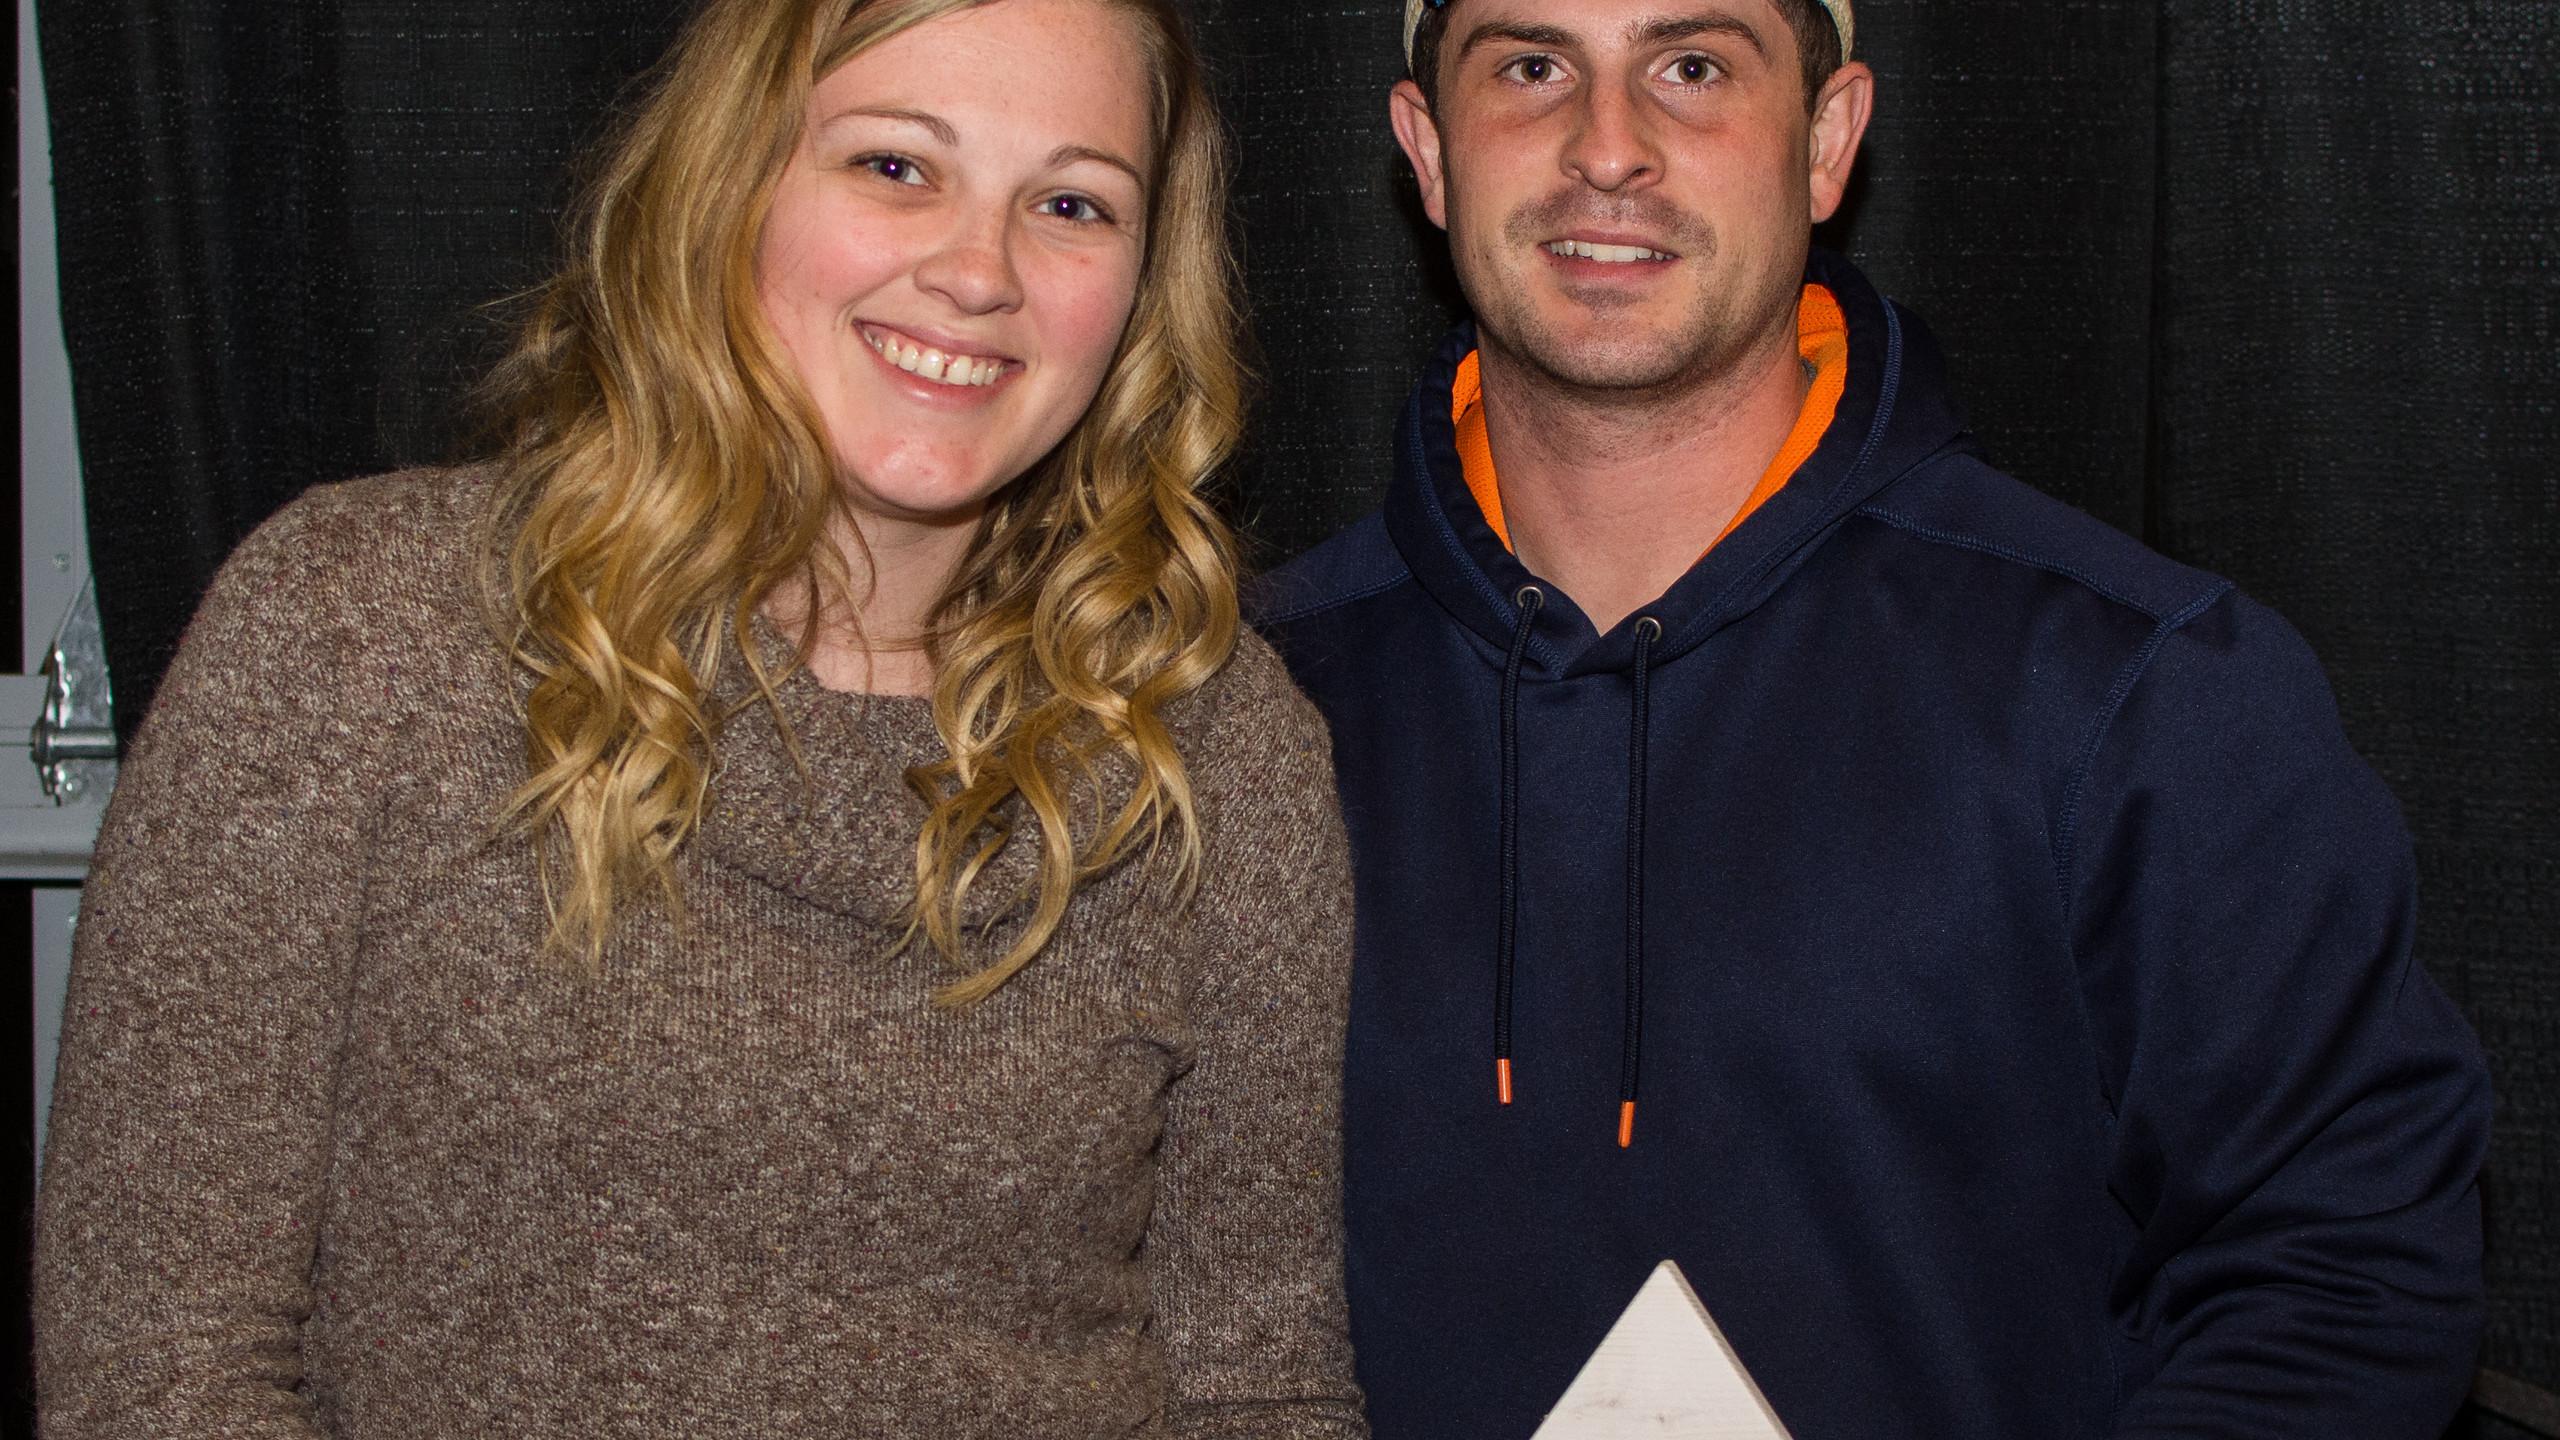 Amanda and Mike Glaser